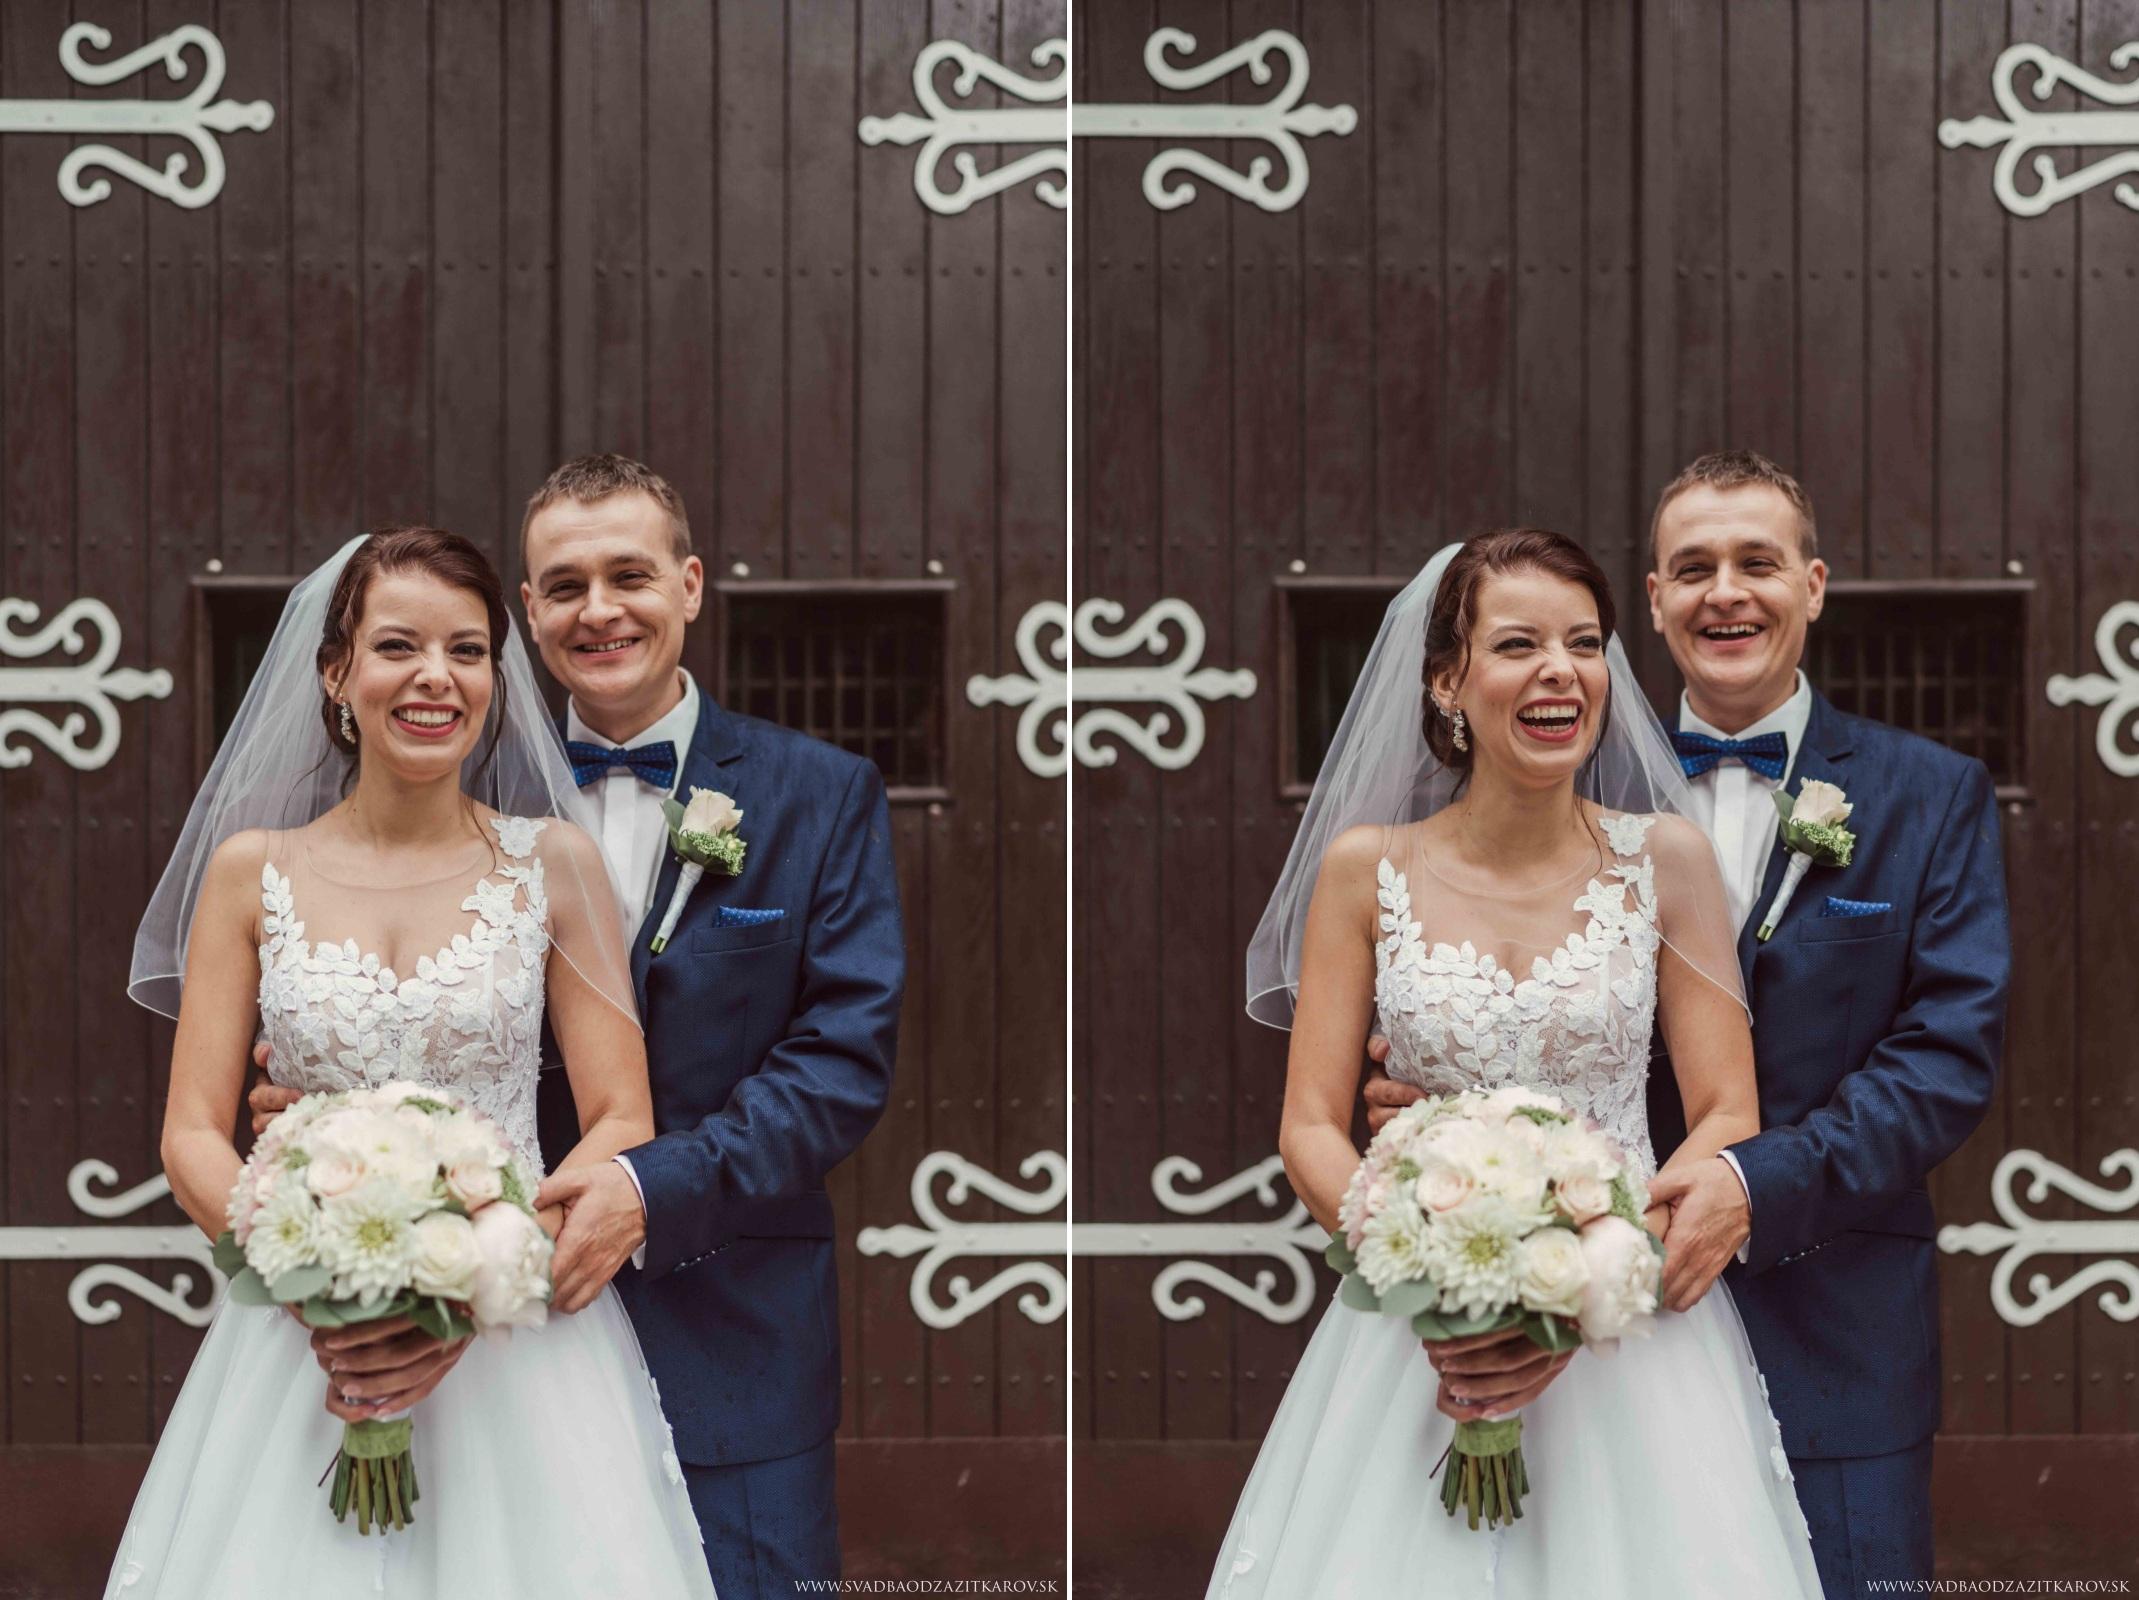 jelitov-kaplnka-svadbajpg